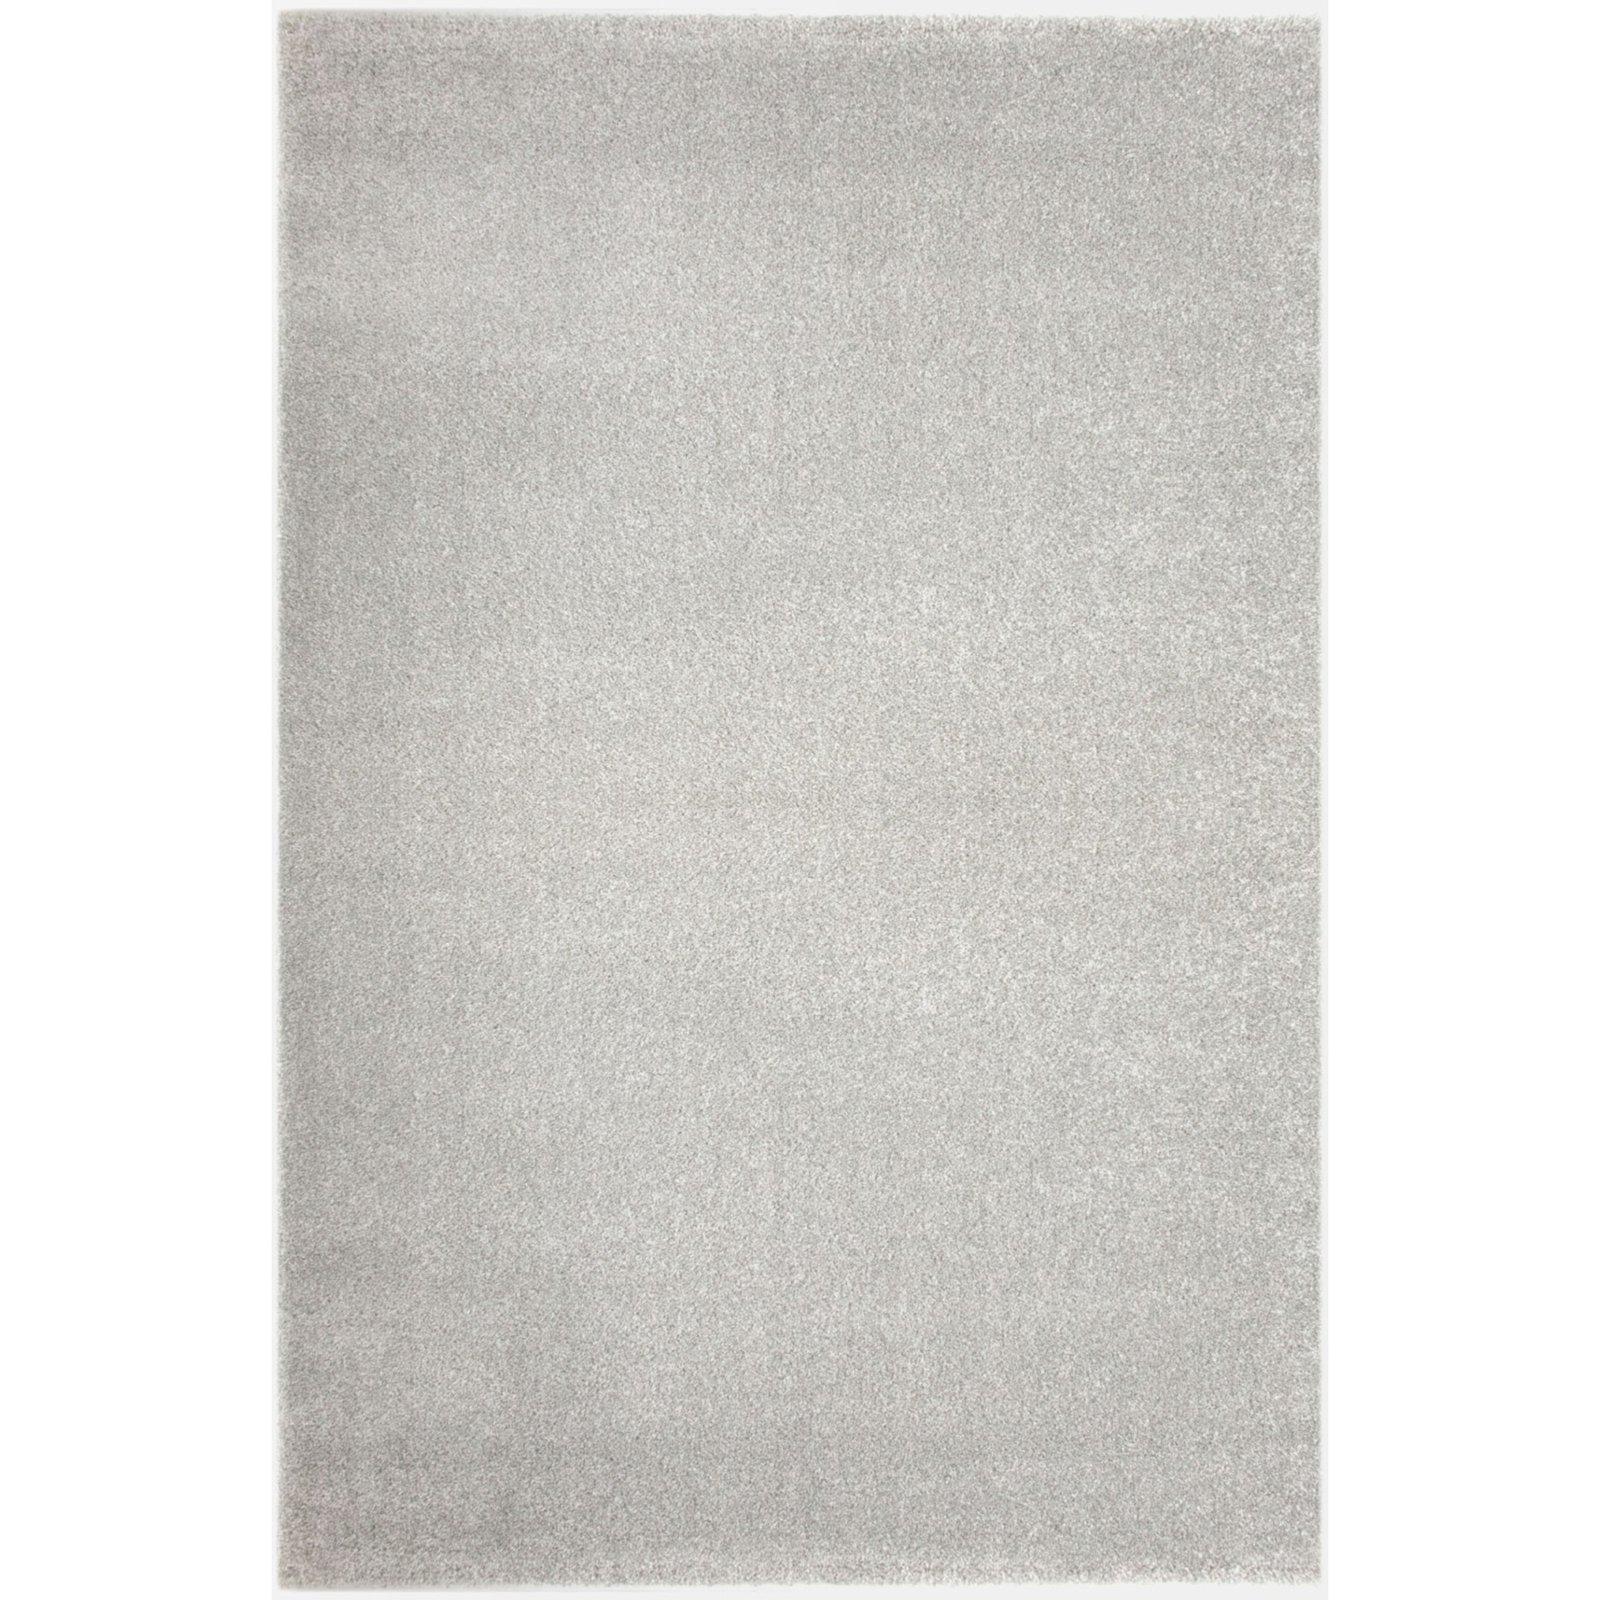 teppich soma grau 120x170 cm einfarbige teppiche. Black Bedroom Furniture Sets. Home Design Ideas